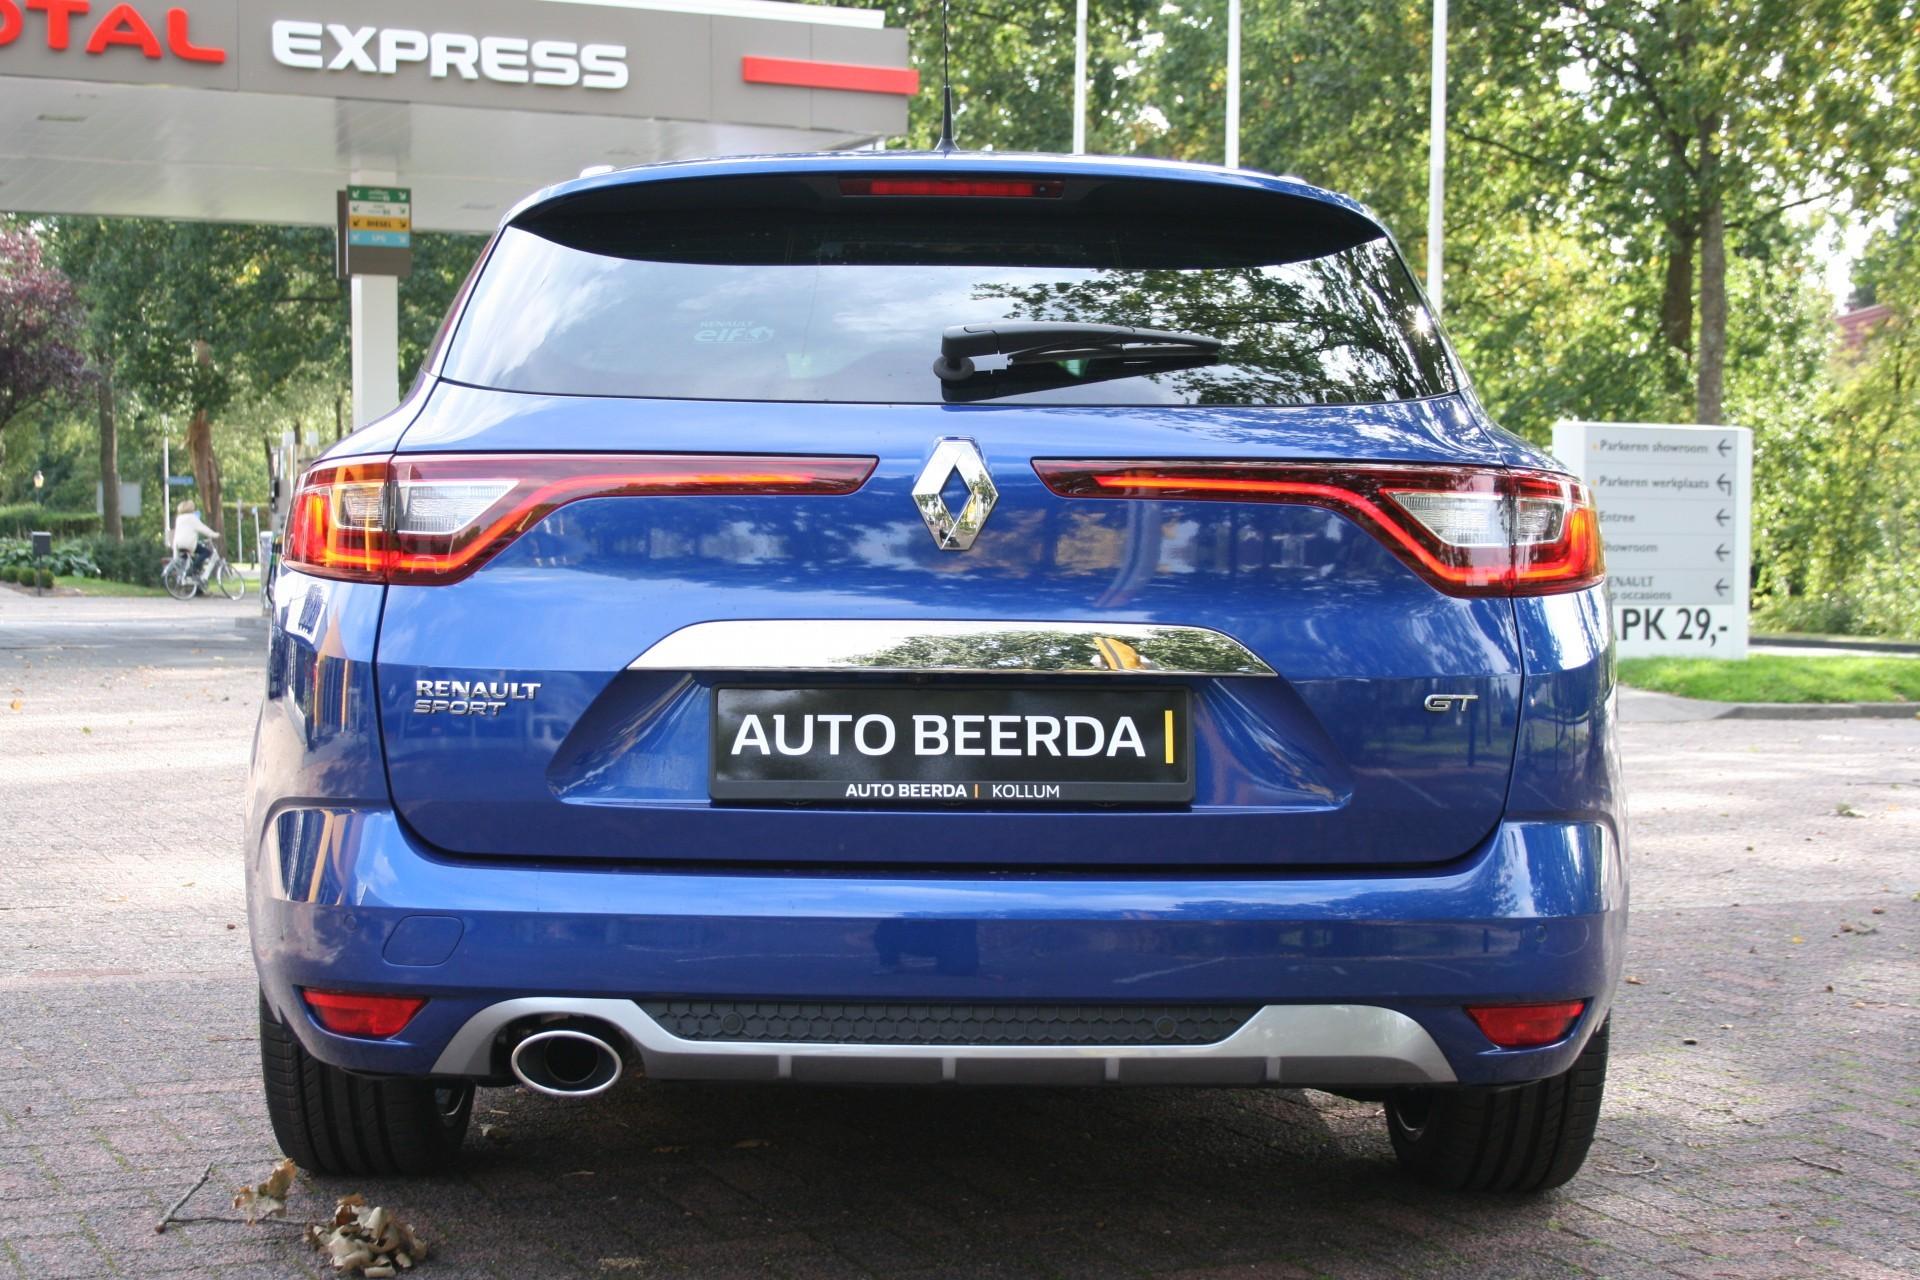 Renault Mégane foto 2